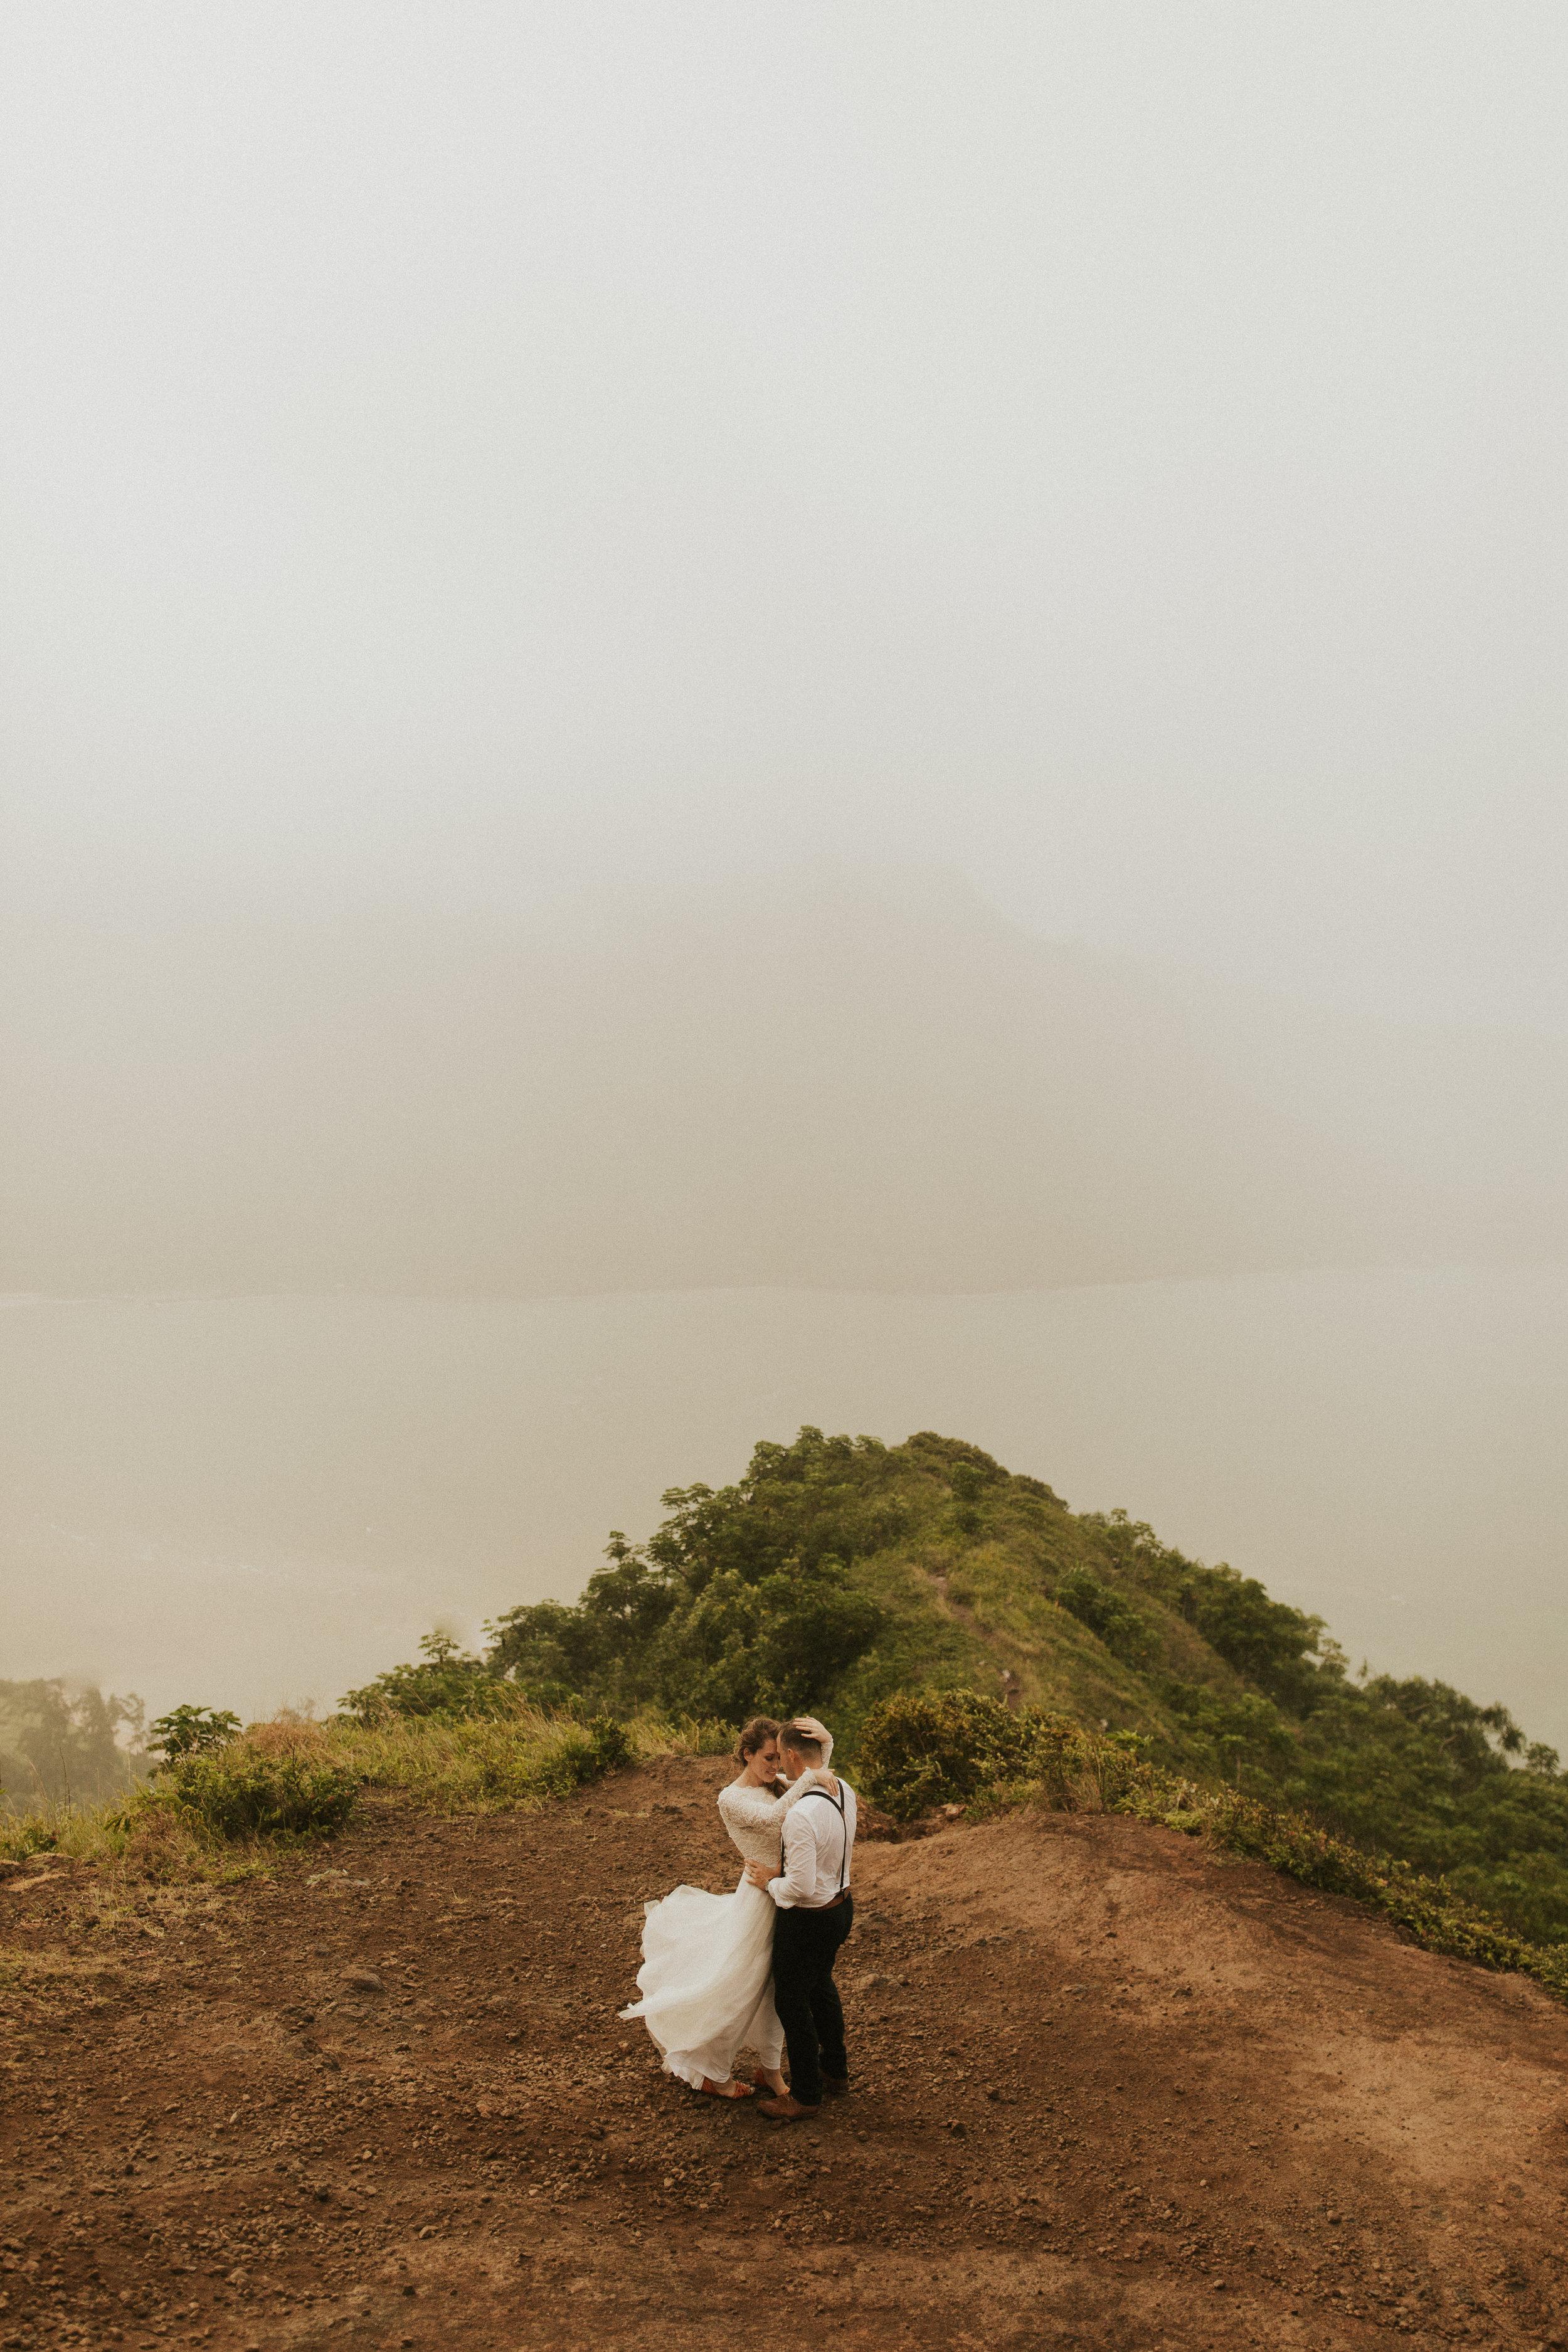 the-mclachlans-destination-elopement-photographers-mountain-hike-sena-eric-146.jpg